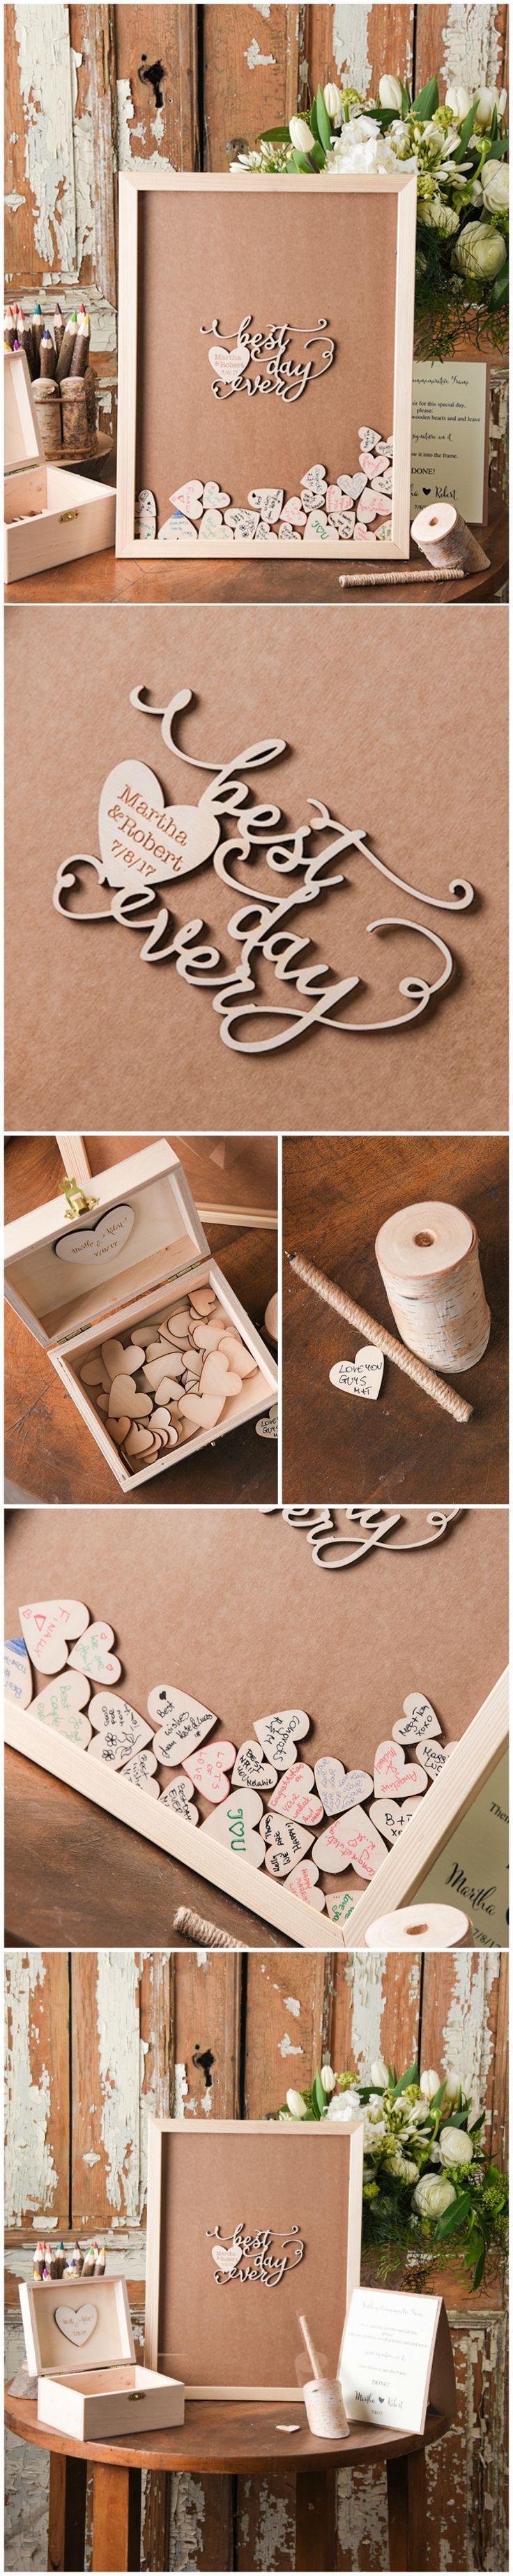 Best Day Ever ! Wooden Wedding Alternative Guest Book Frame #frame #guestbook #rustic #country #weddingideas #weddinggift #dropbox #unique #weddingframe